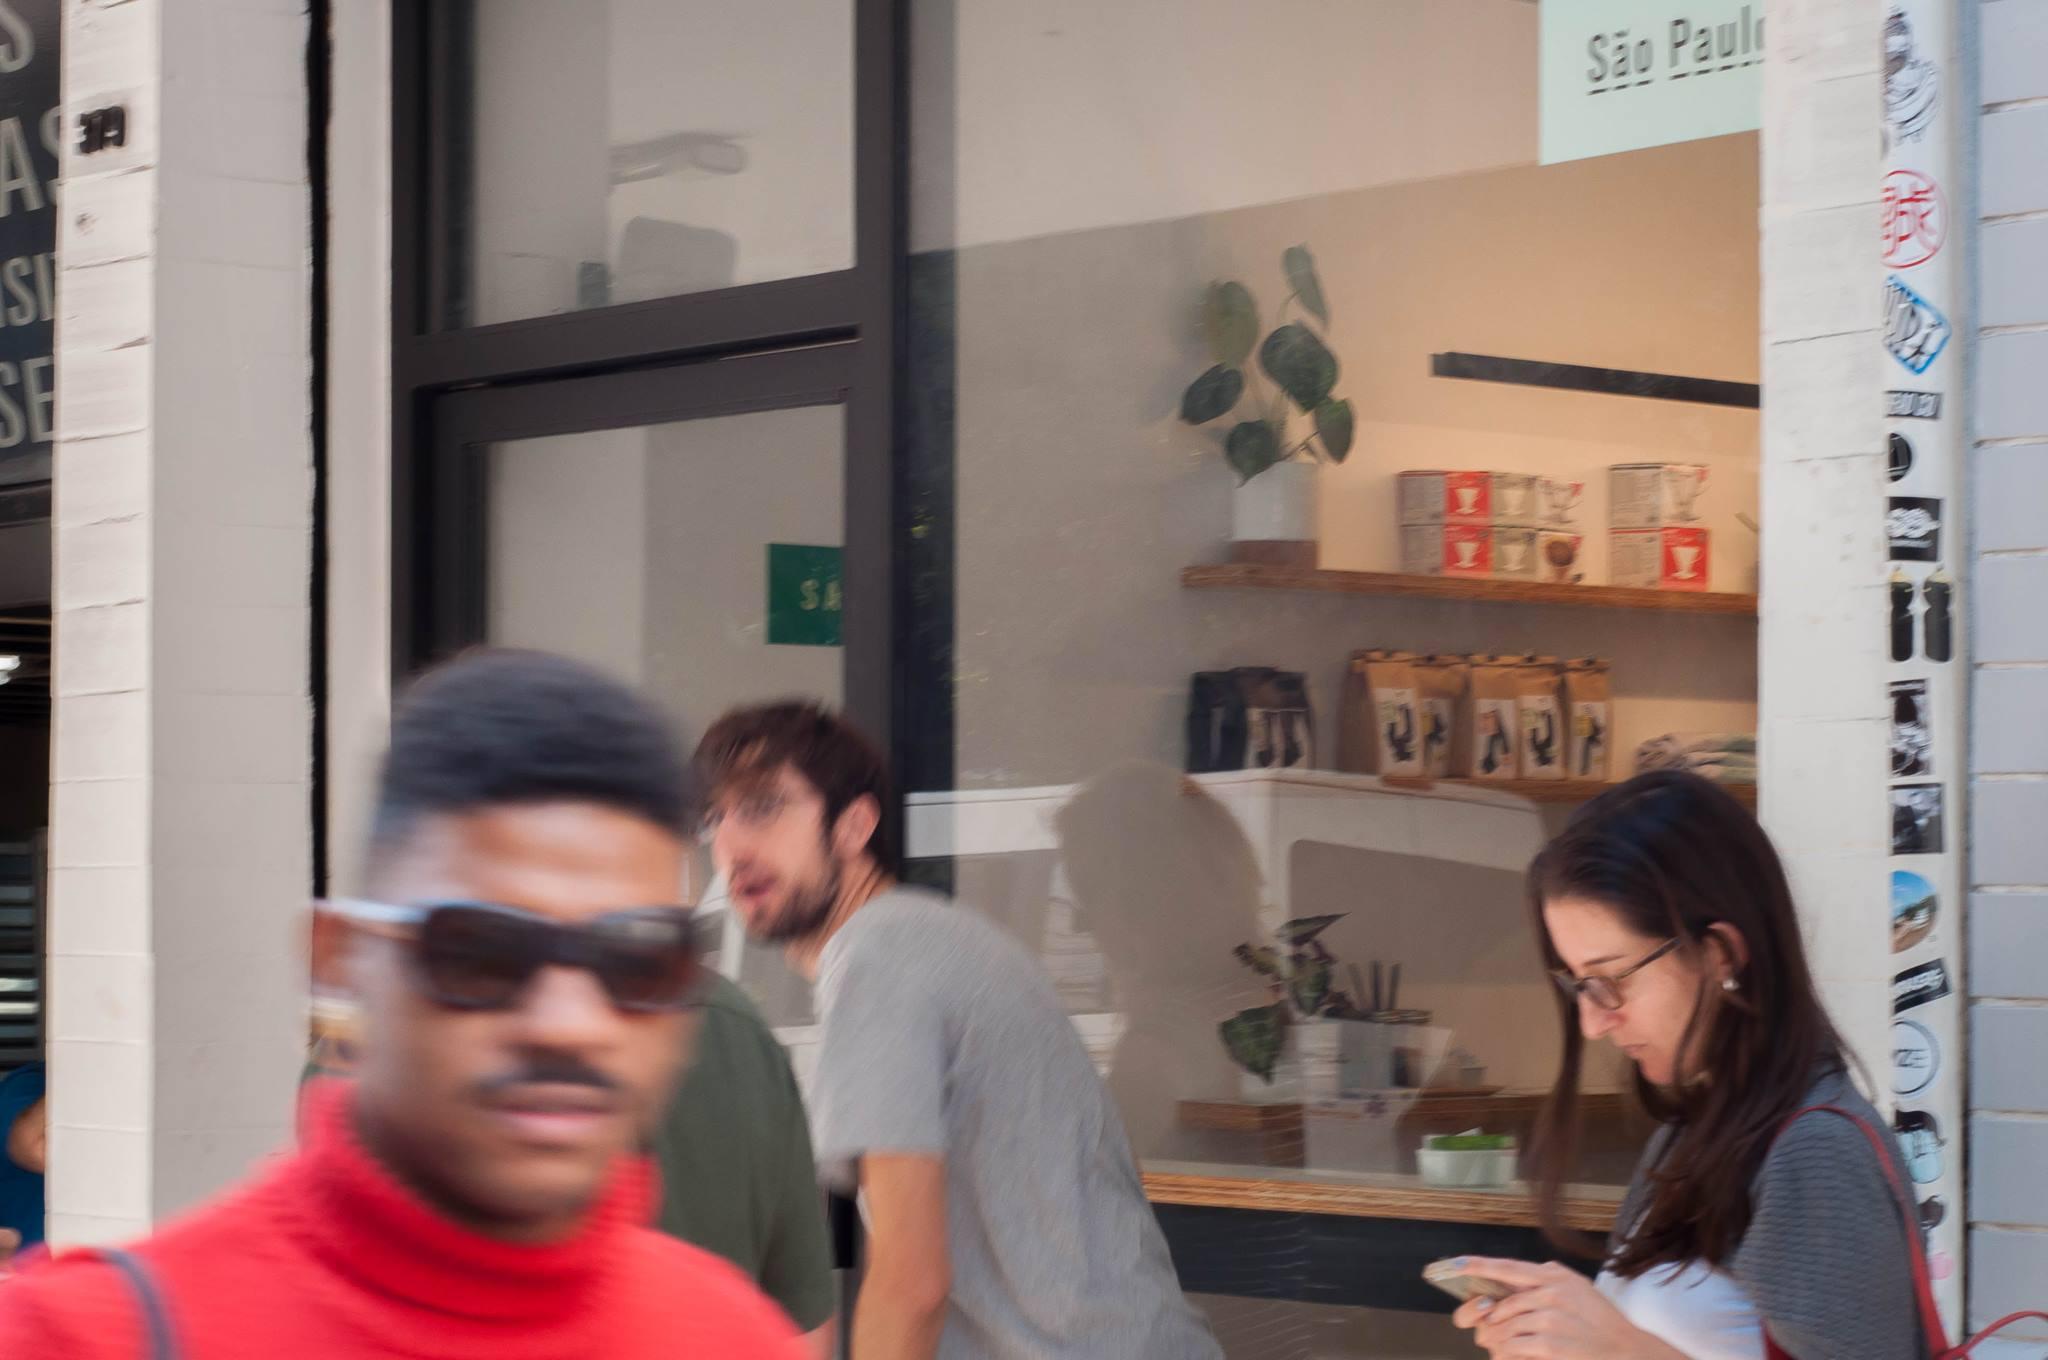 griot-mag-gabriel-hilair-dudus-brasile-razzismo-arte-creatività-Another hi-re pic of a place I love in San Paulo (Takkø Café São Paulo) by Barbosa